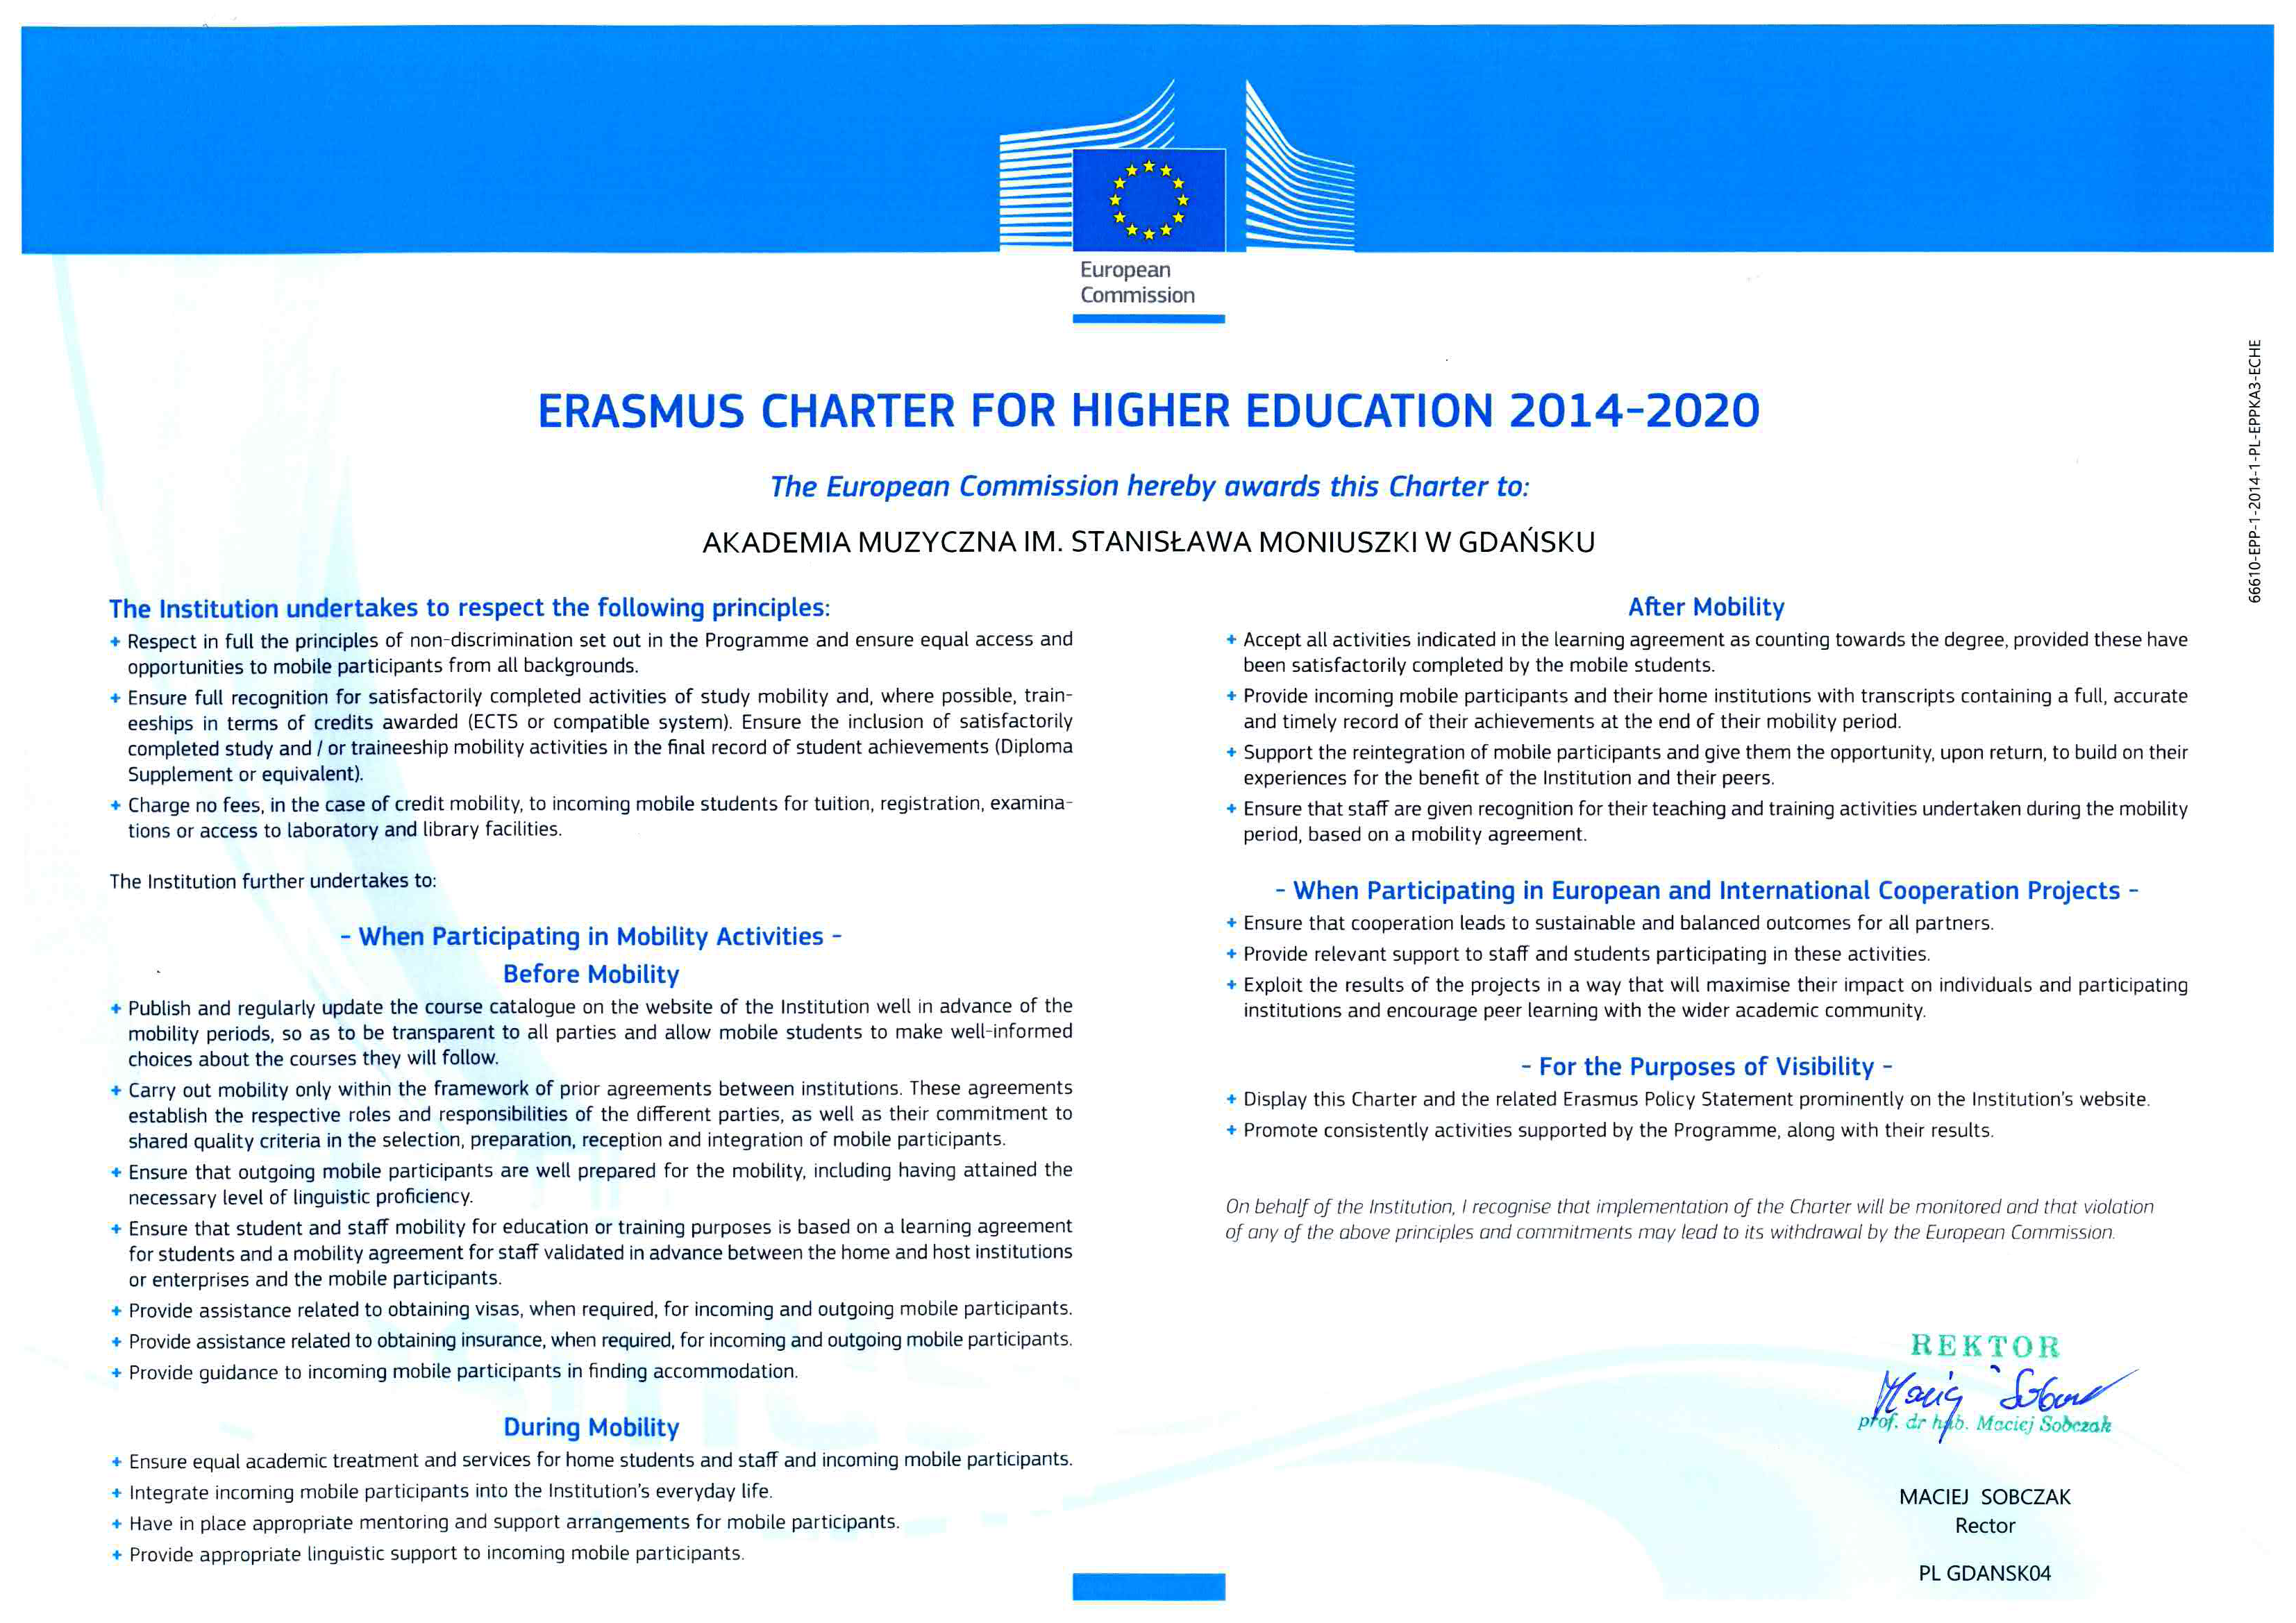 ECHE_2014-2020